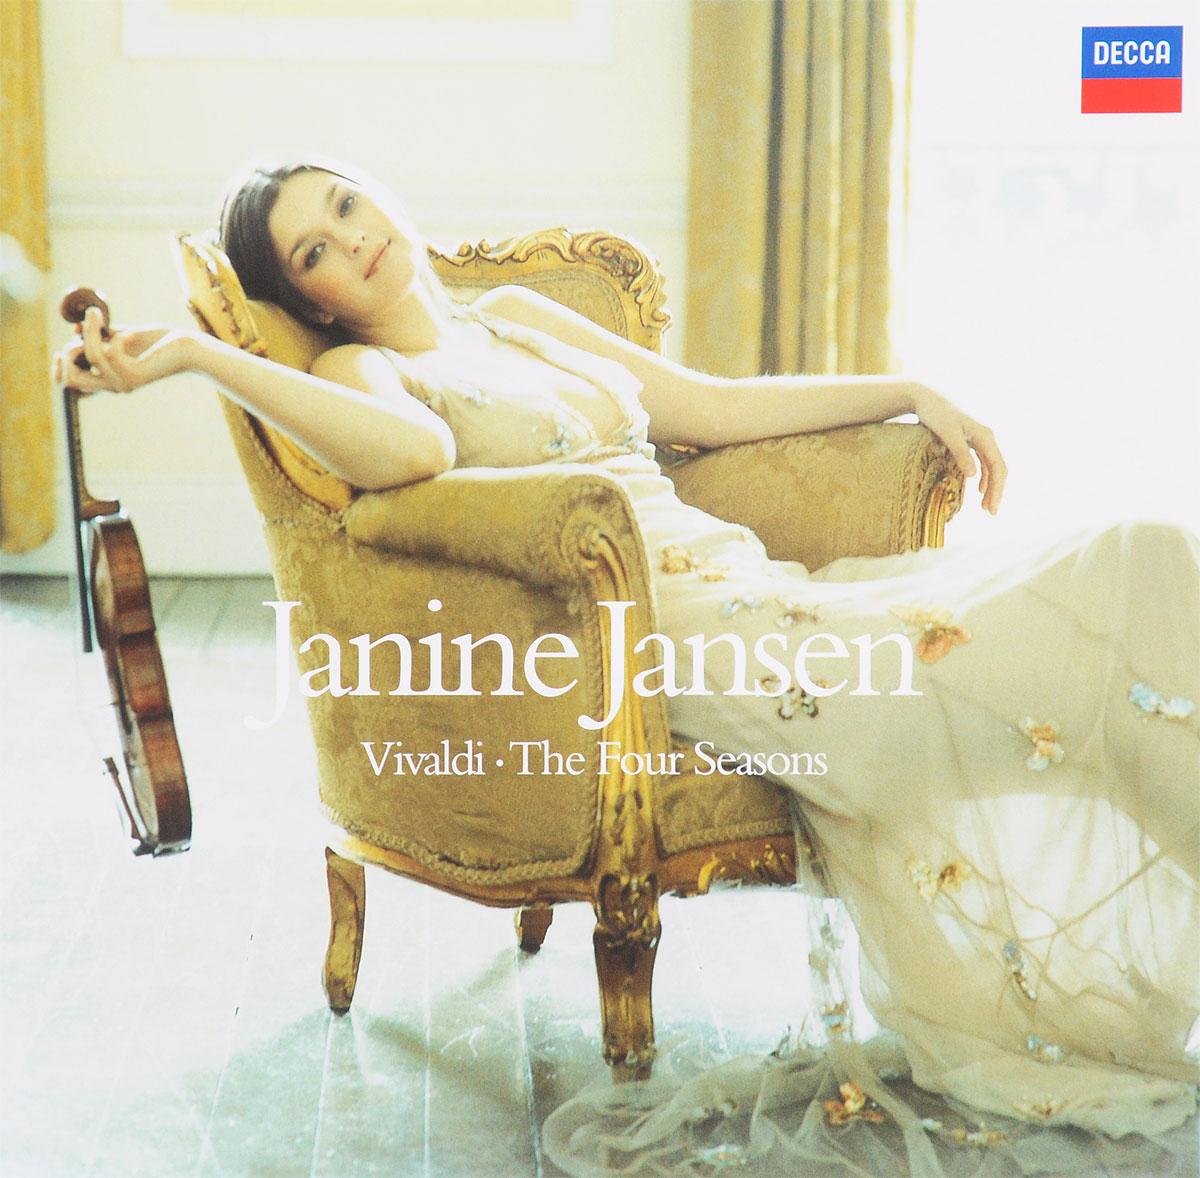 Дженин Дженсен Janine Jansen. Vivaldi. The Four Seasons (LP) дженин дженсен janine jansen prokofiev